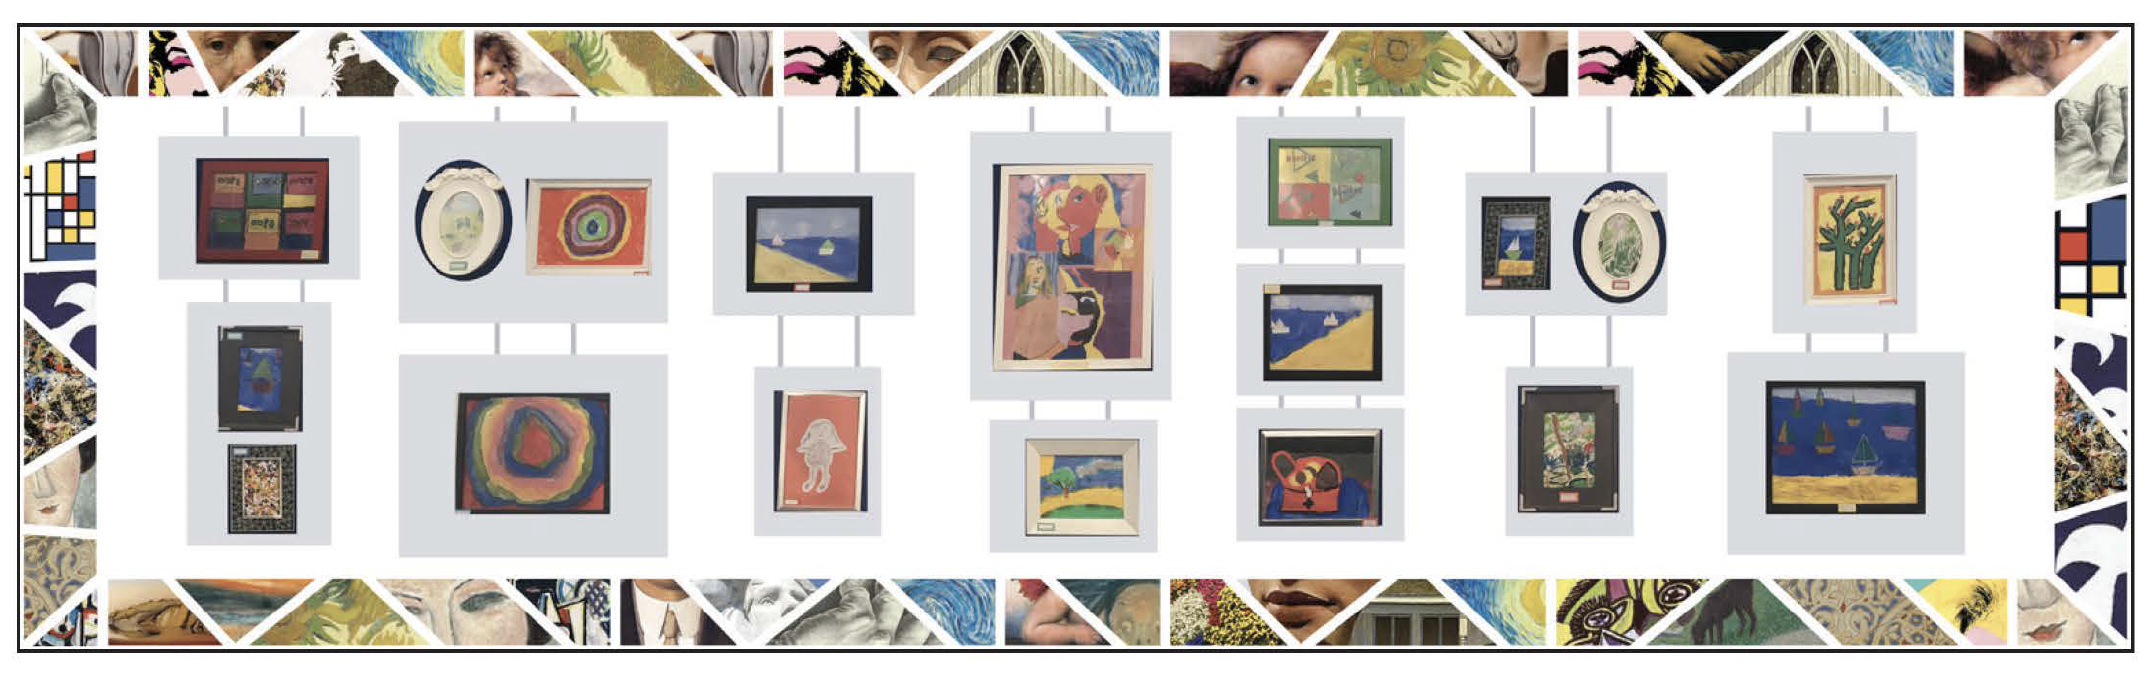 Updatable art gallery display